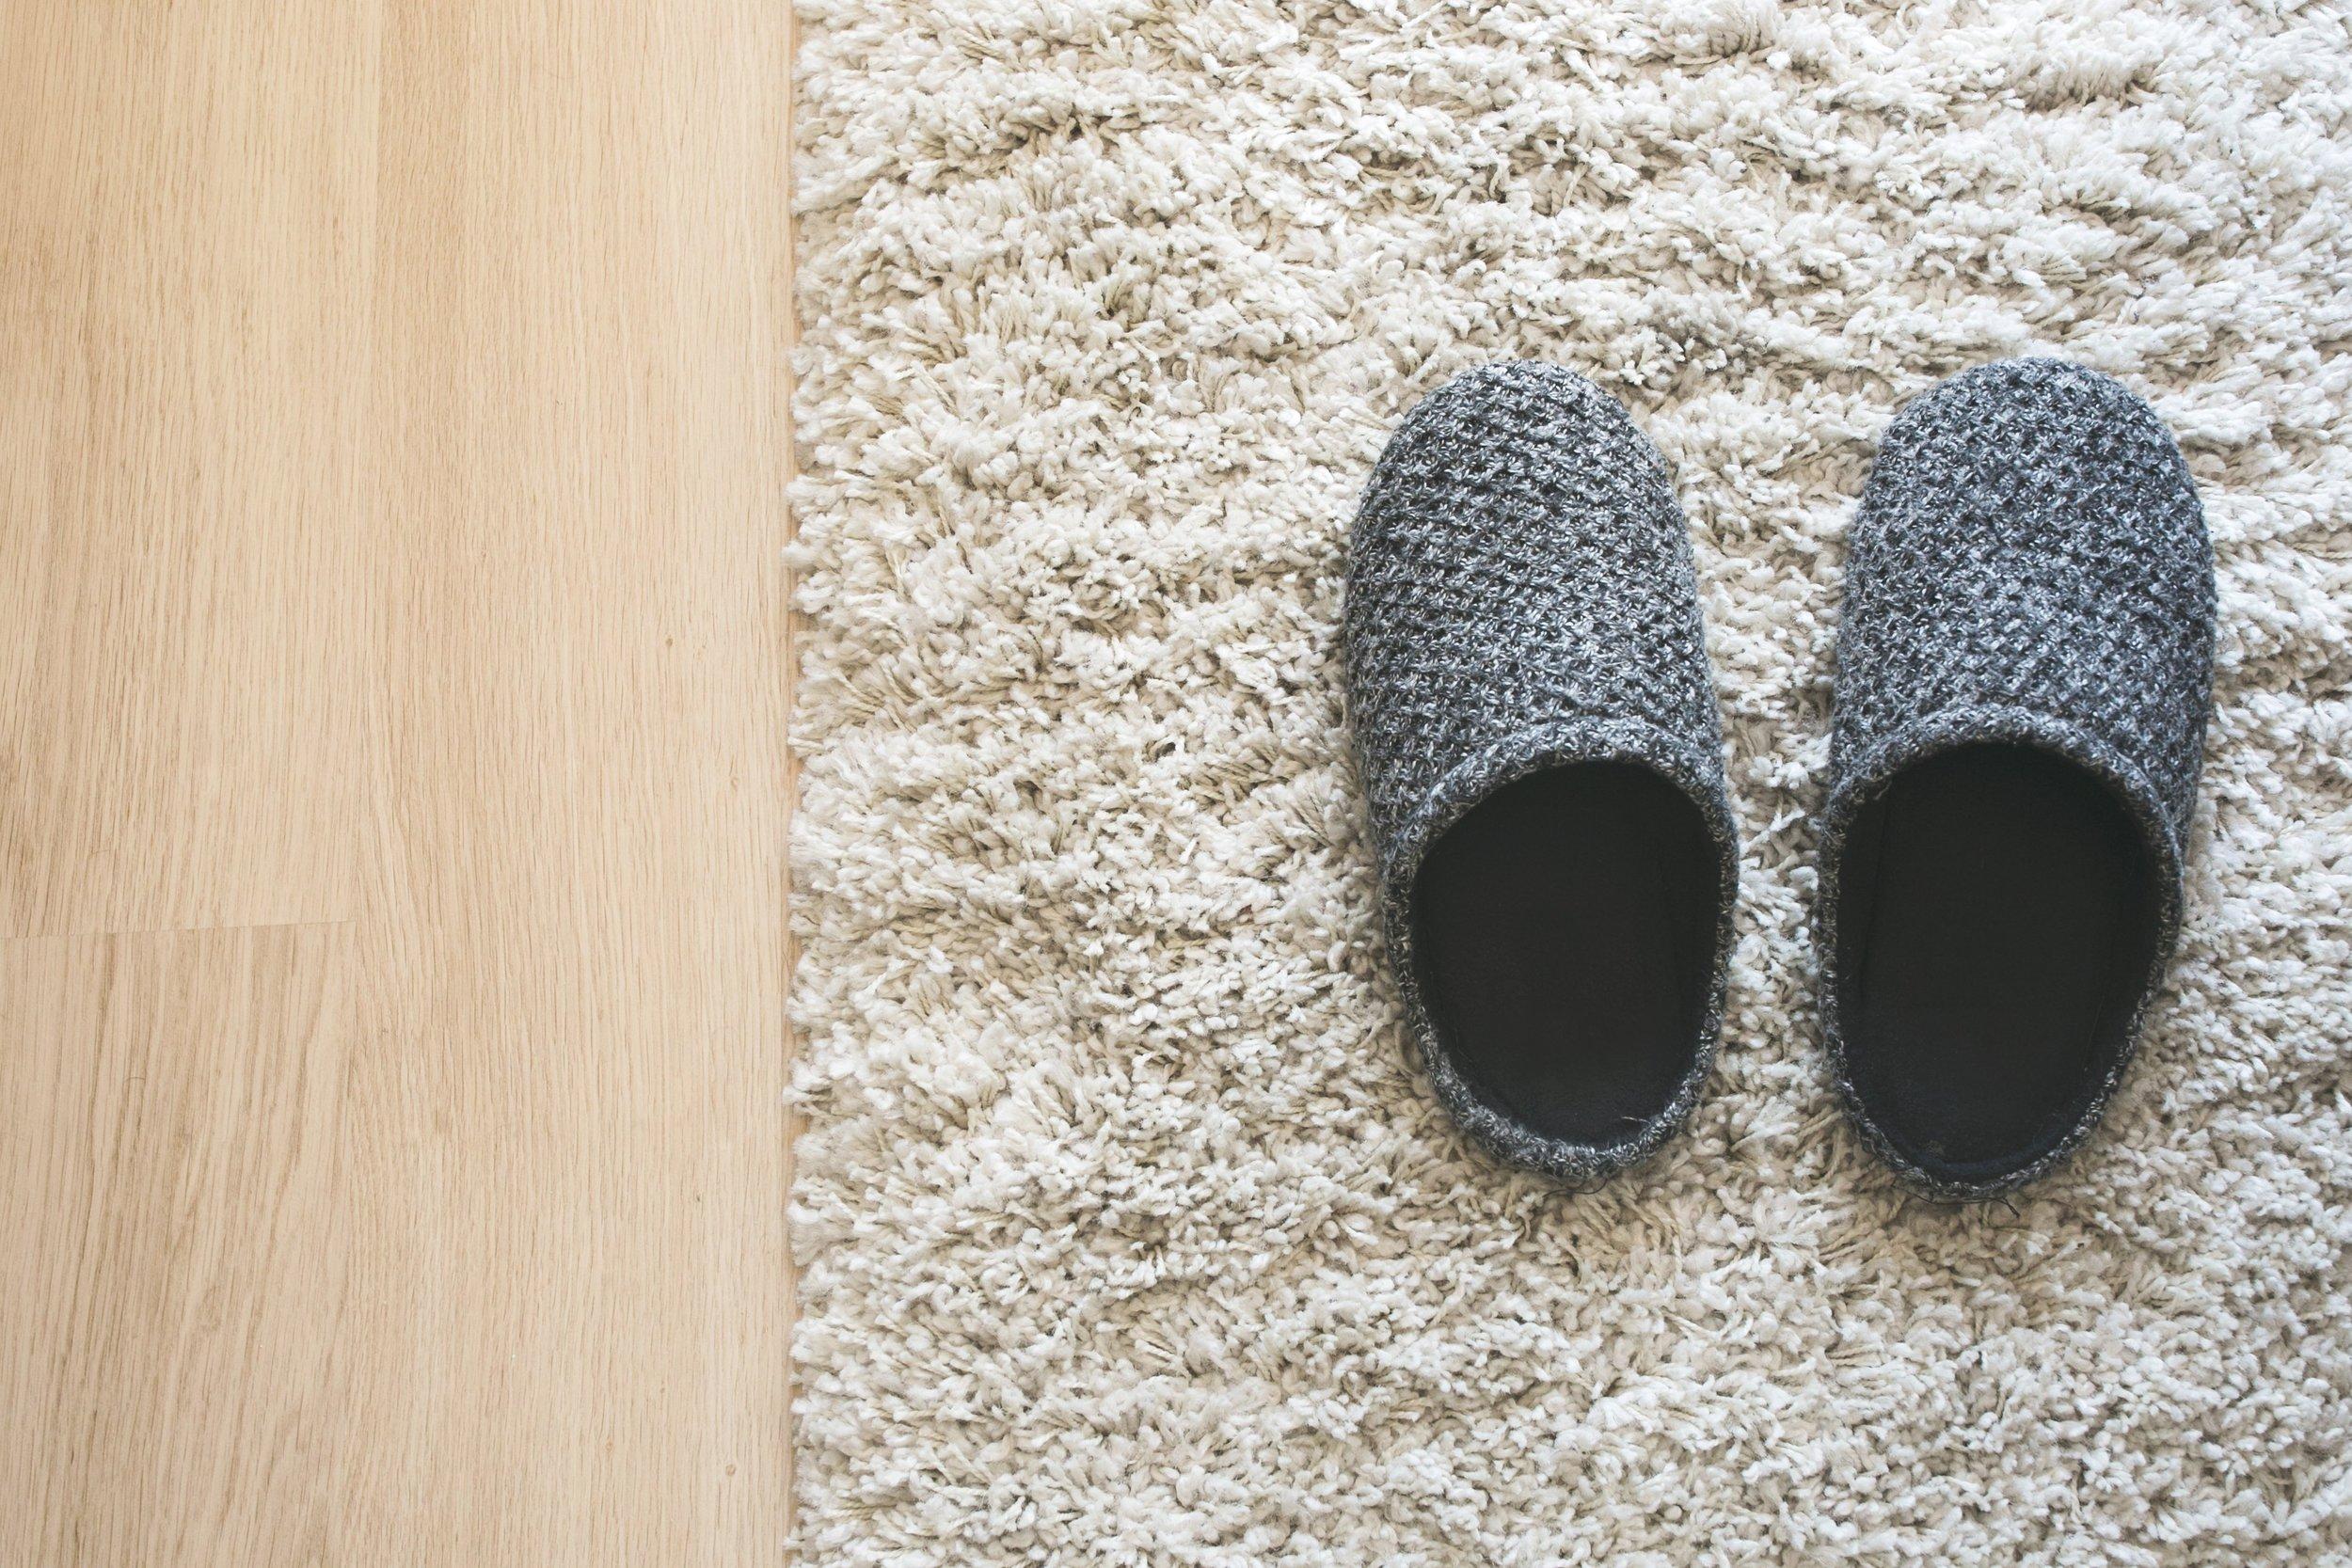 grey-slippers-on-carpet_4460x4460.jpg